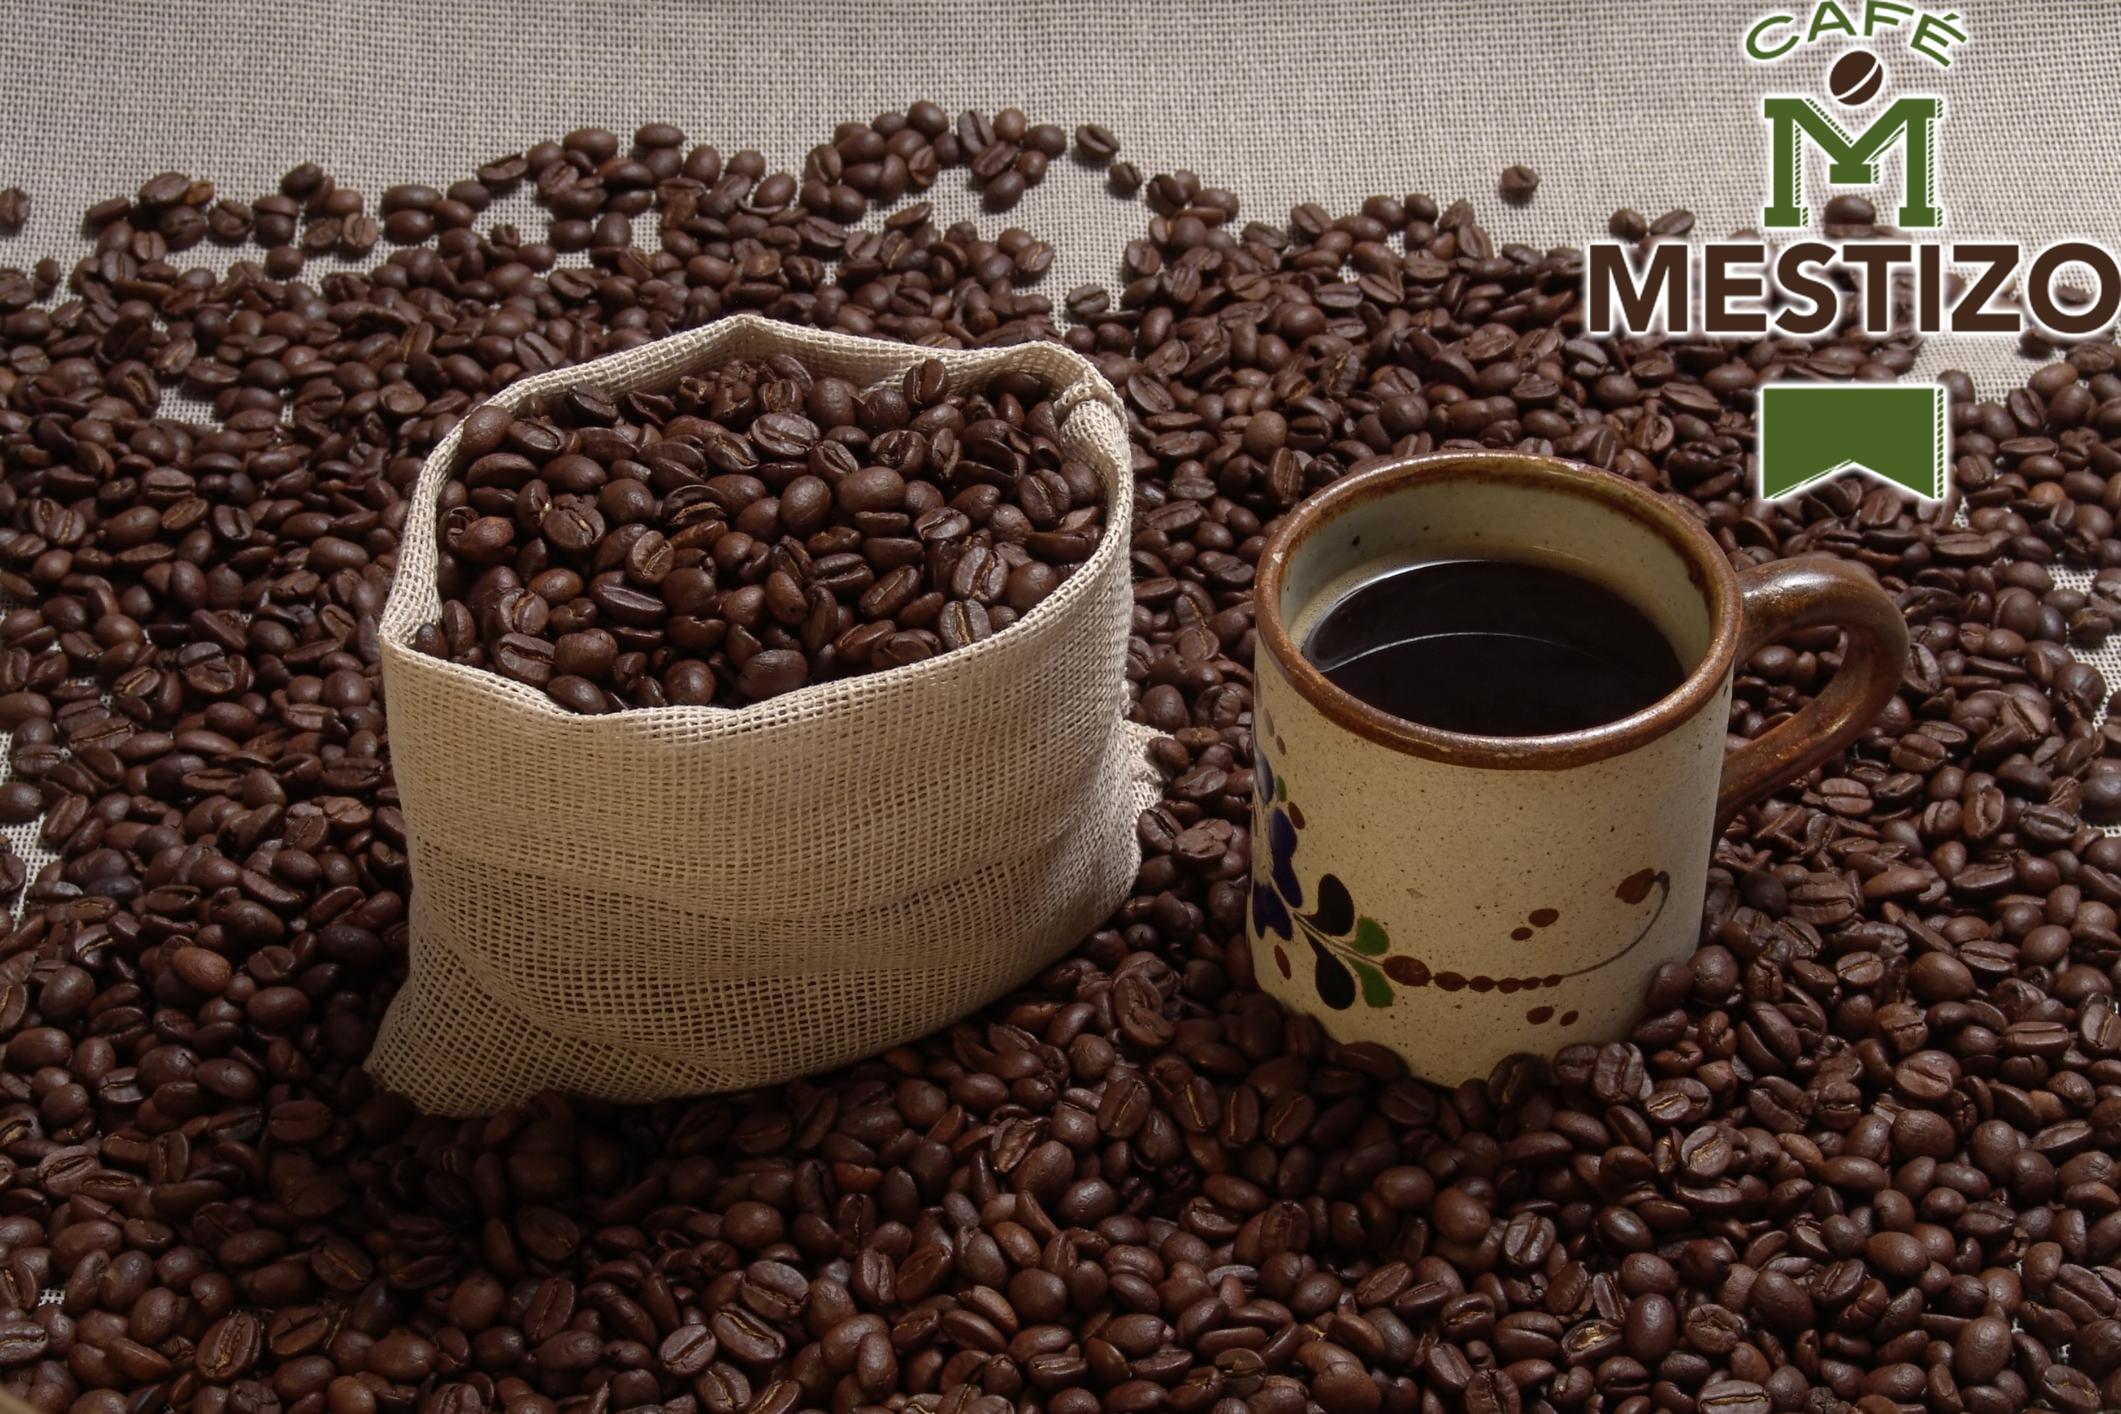 CAFE MESTIZO